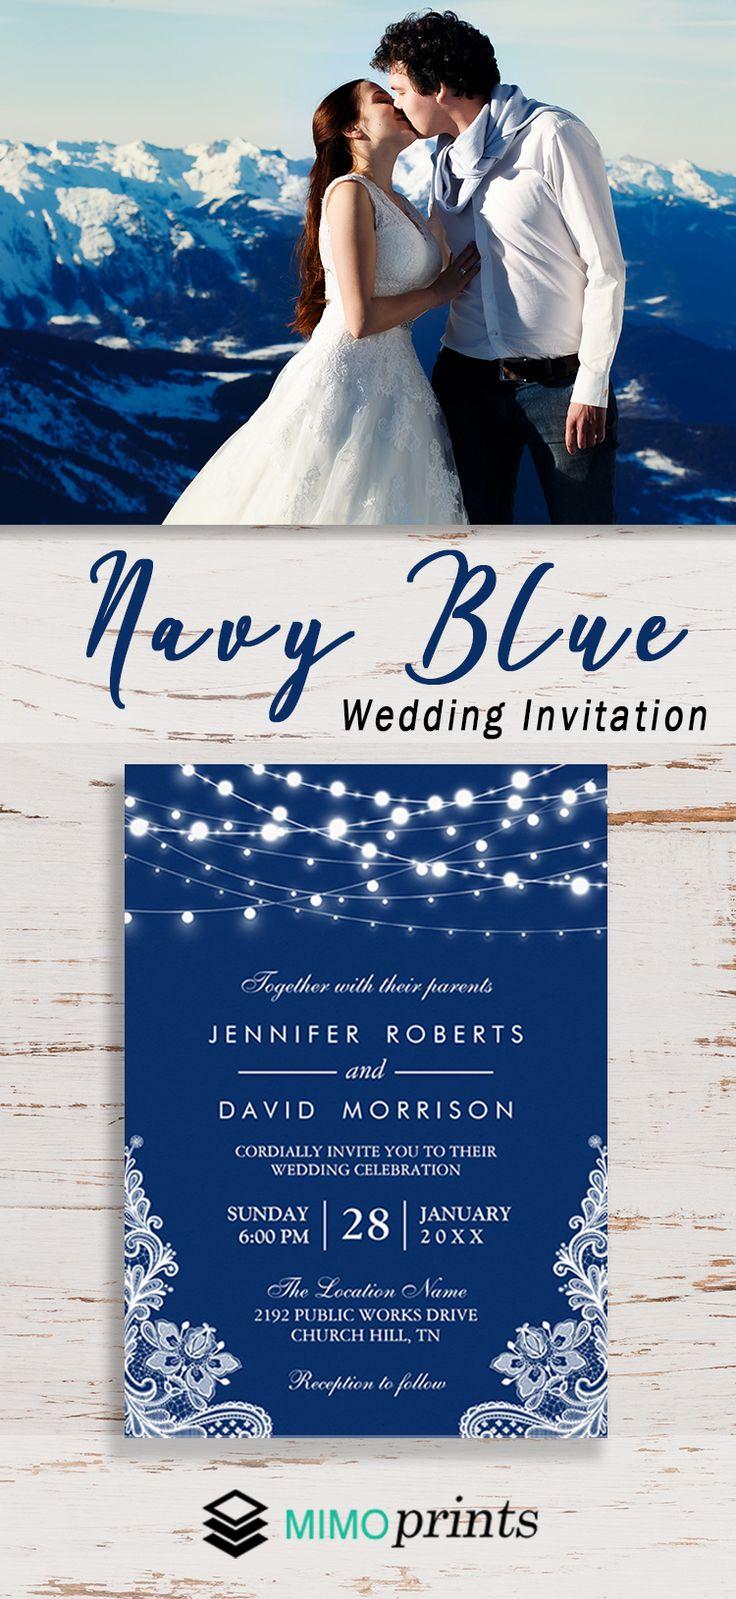 reception information on back of wedding invitation%0A Elegant String Lights White Lace Navy Blue Wedding Card